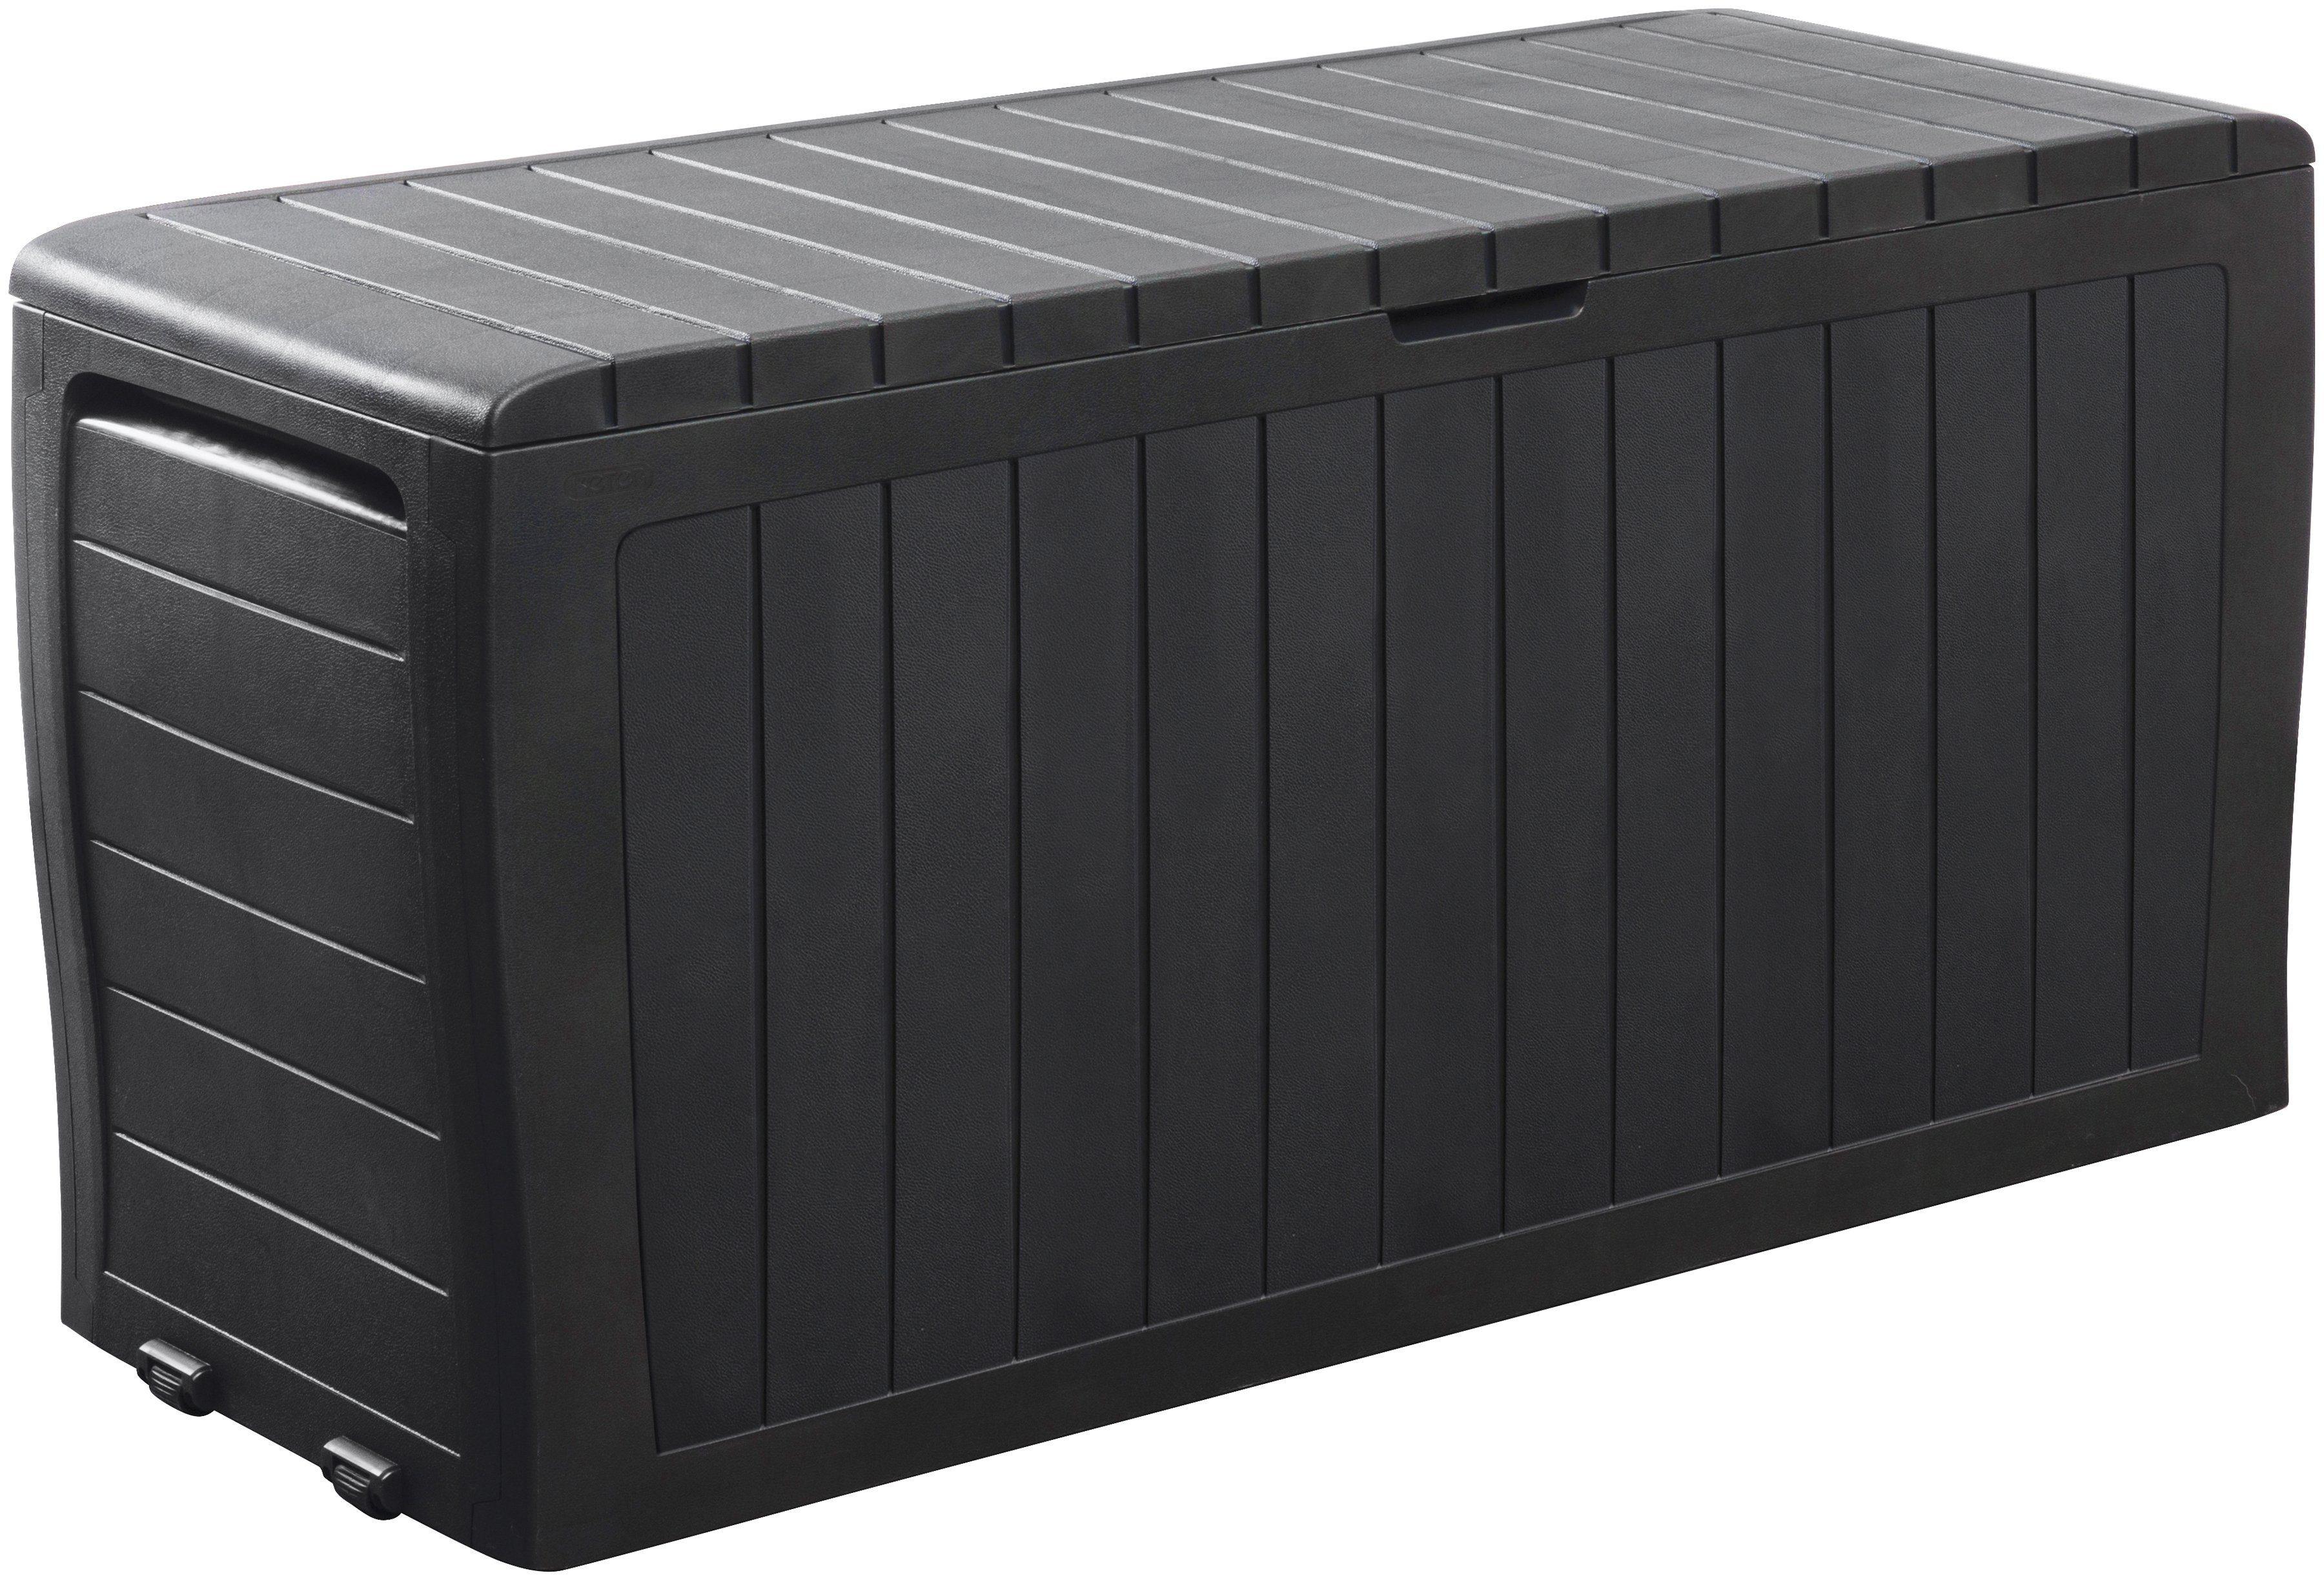 KETER Auflagenbox »Marvel Plus Box 270 l«, 116,7x44,7x57 cm, Polypropylen, anthrazit